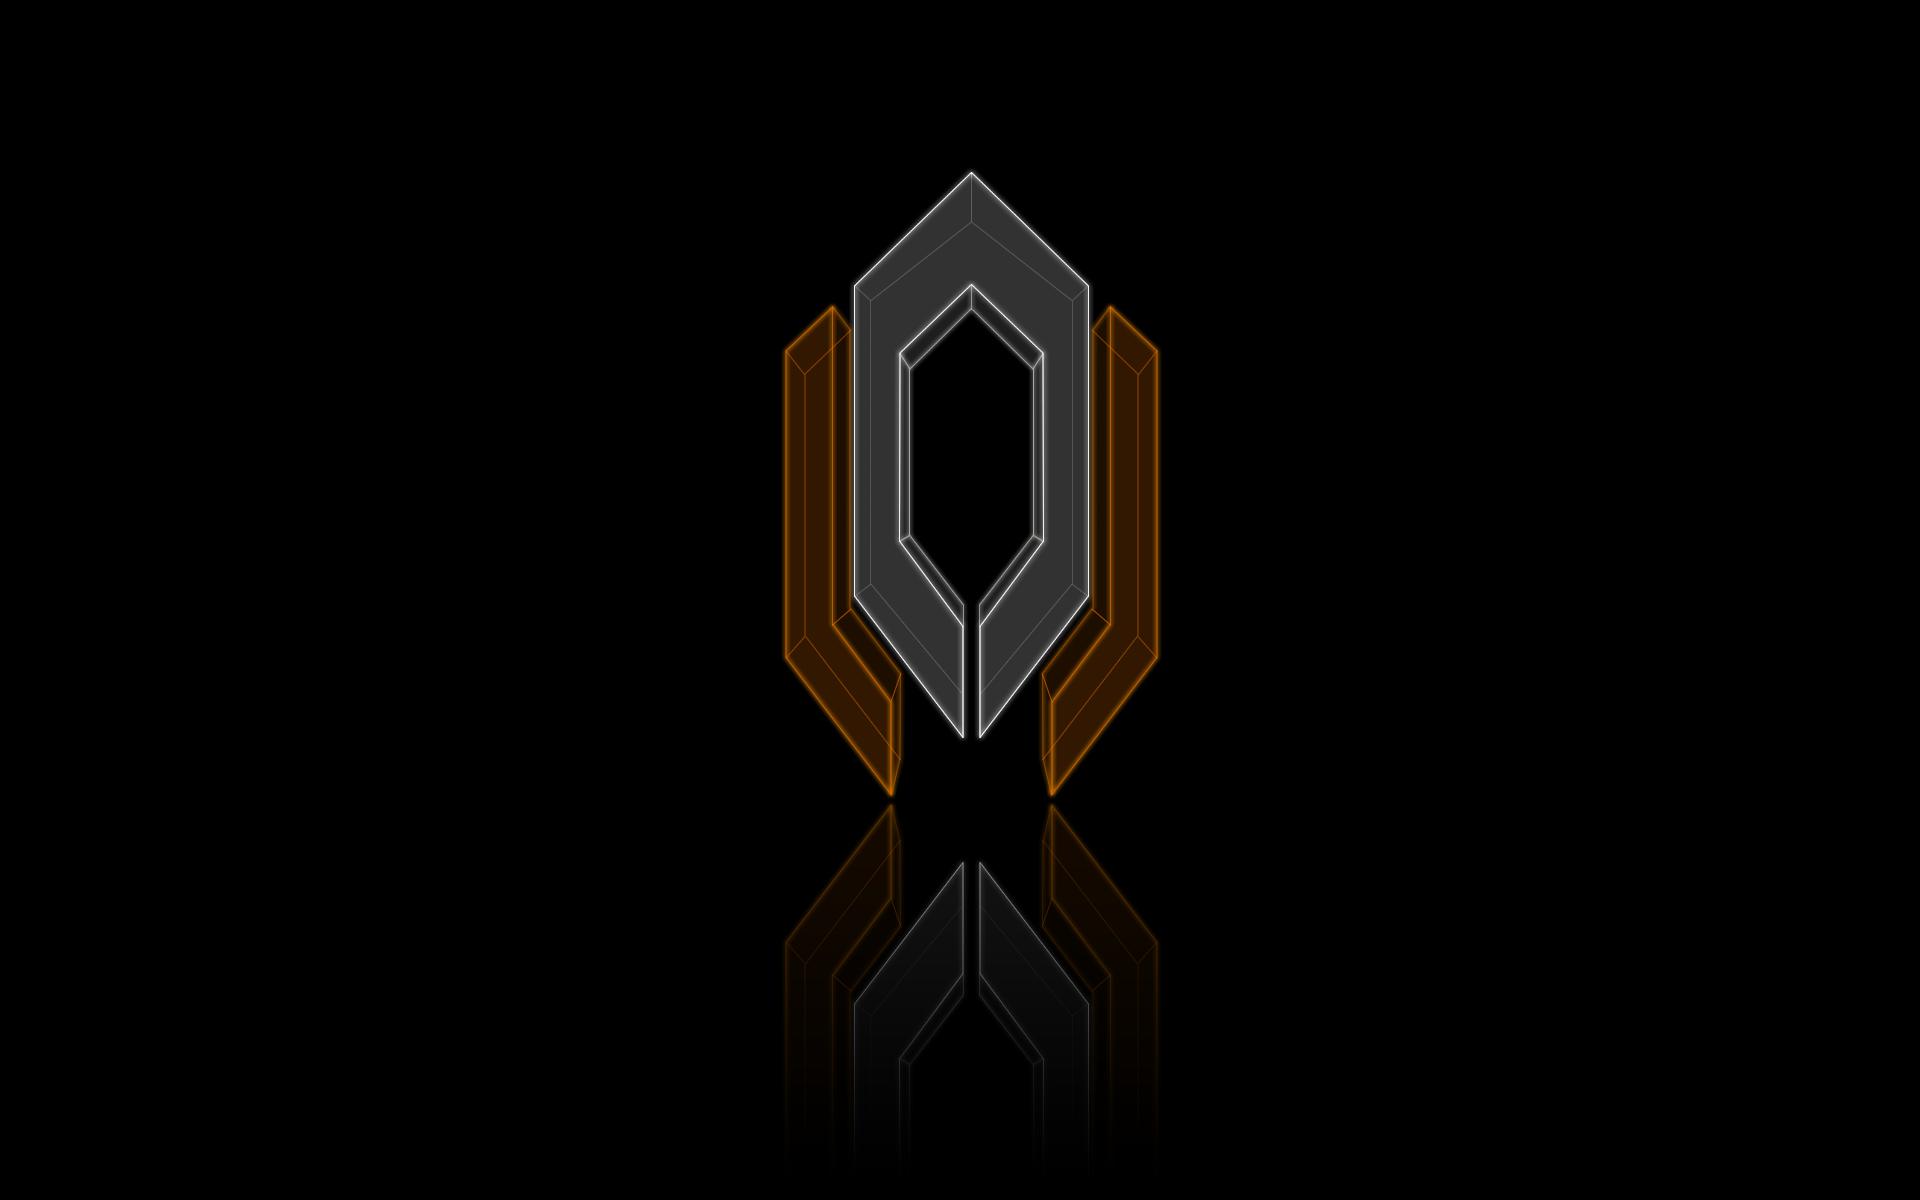 Cerebus network minecraft сервер - 23f7